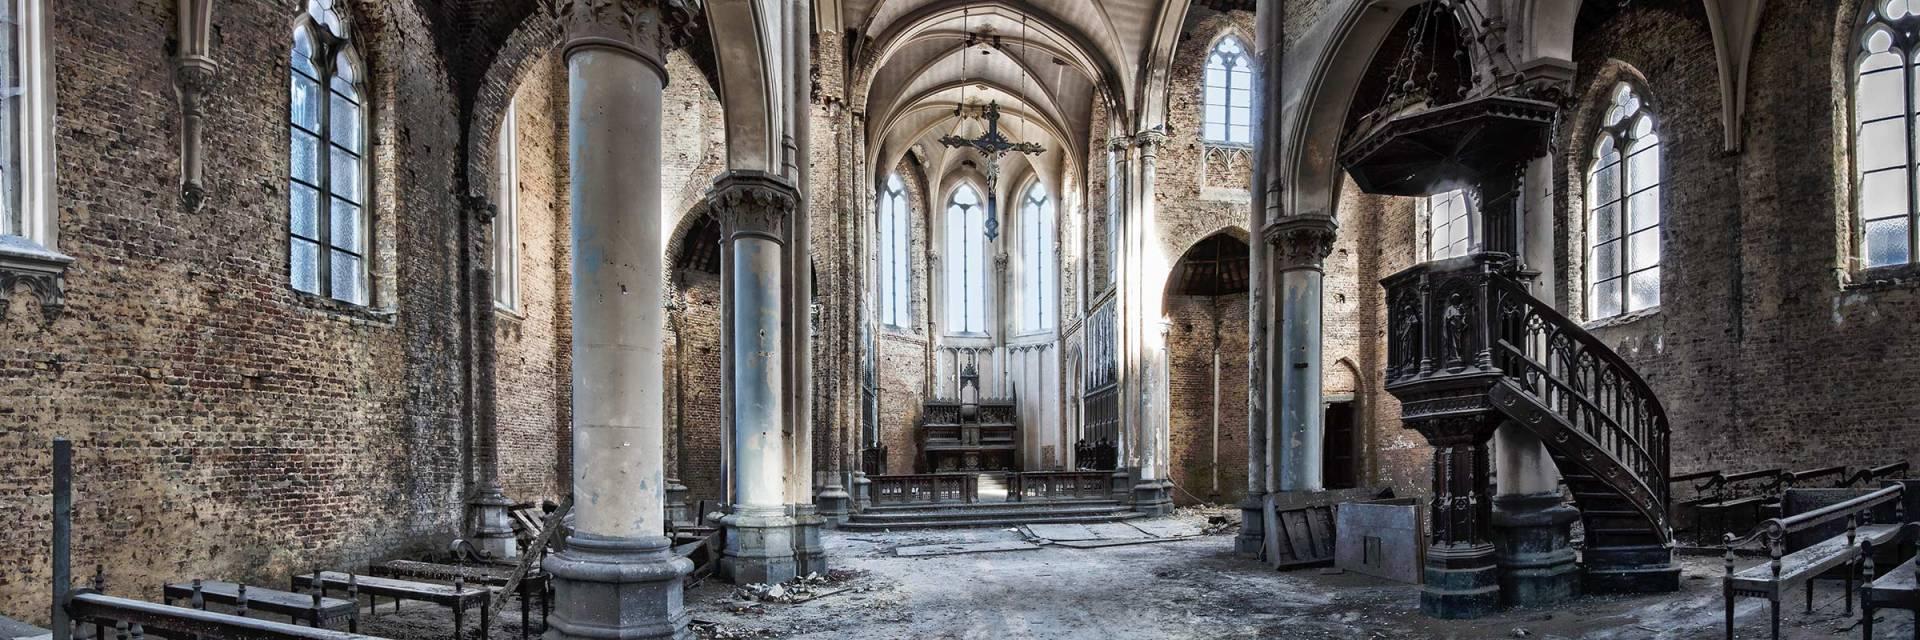 Blue Christ Church, urbexlocatie, vervallen, religie